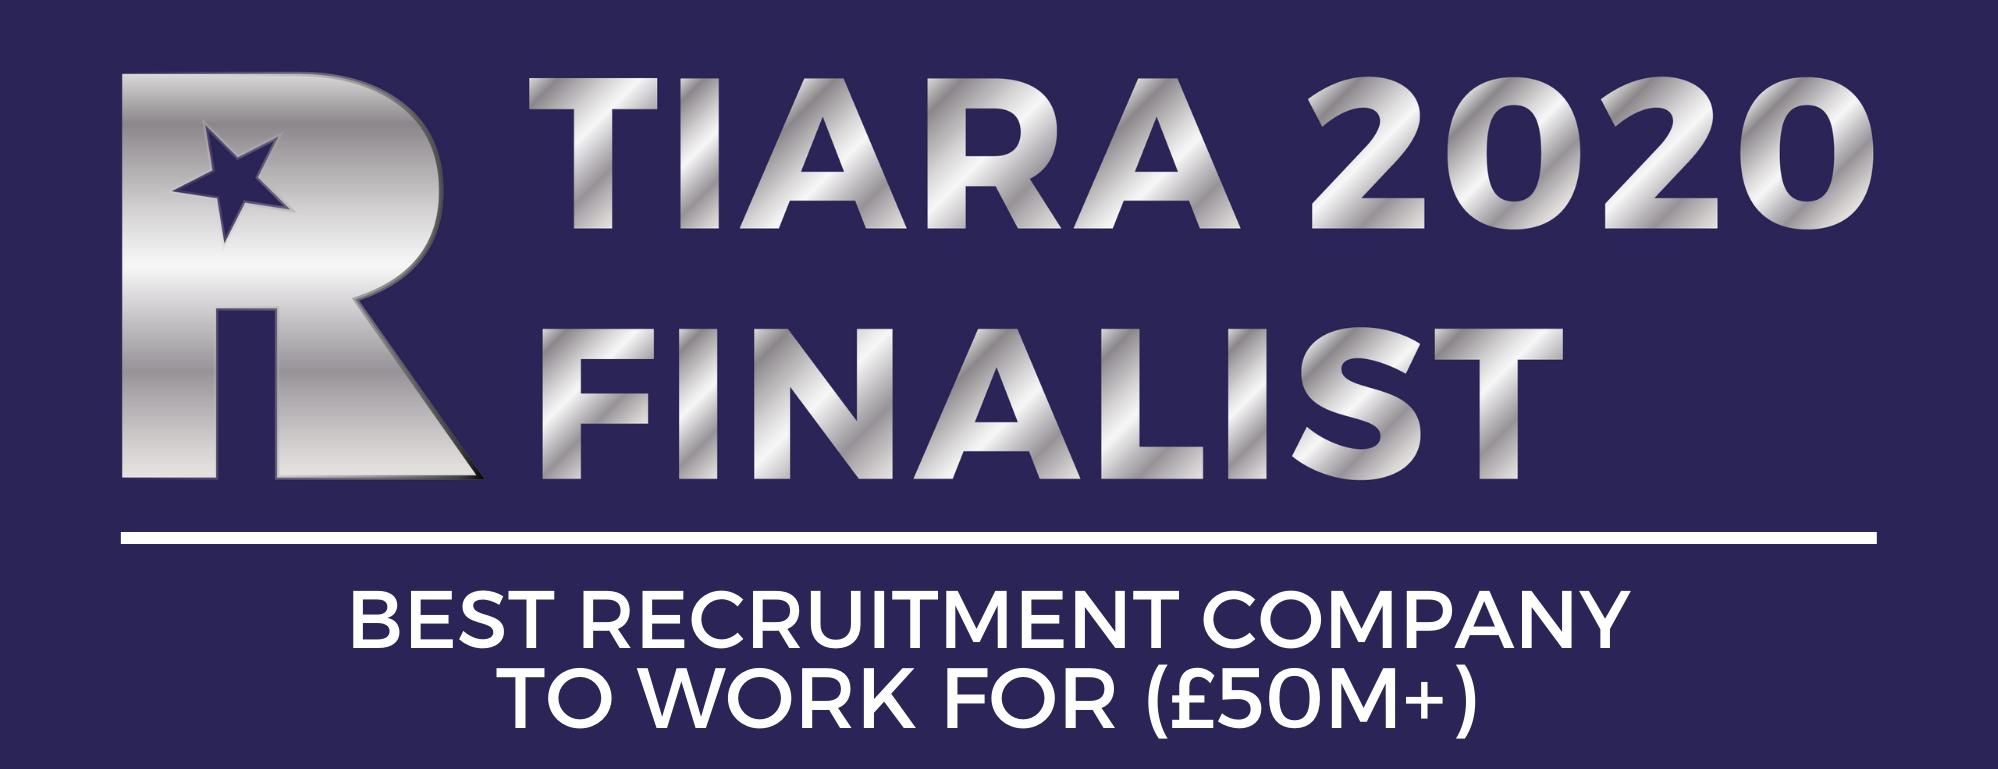 Best Recruitment £50M+